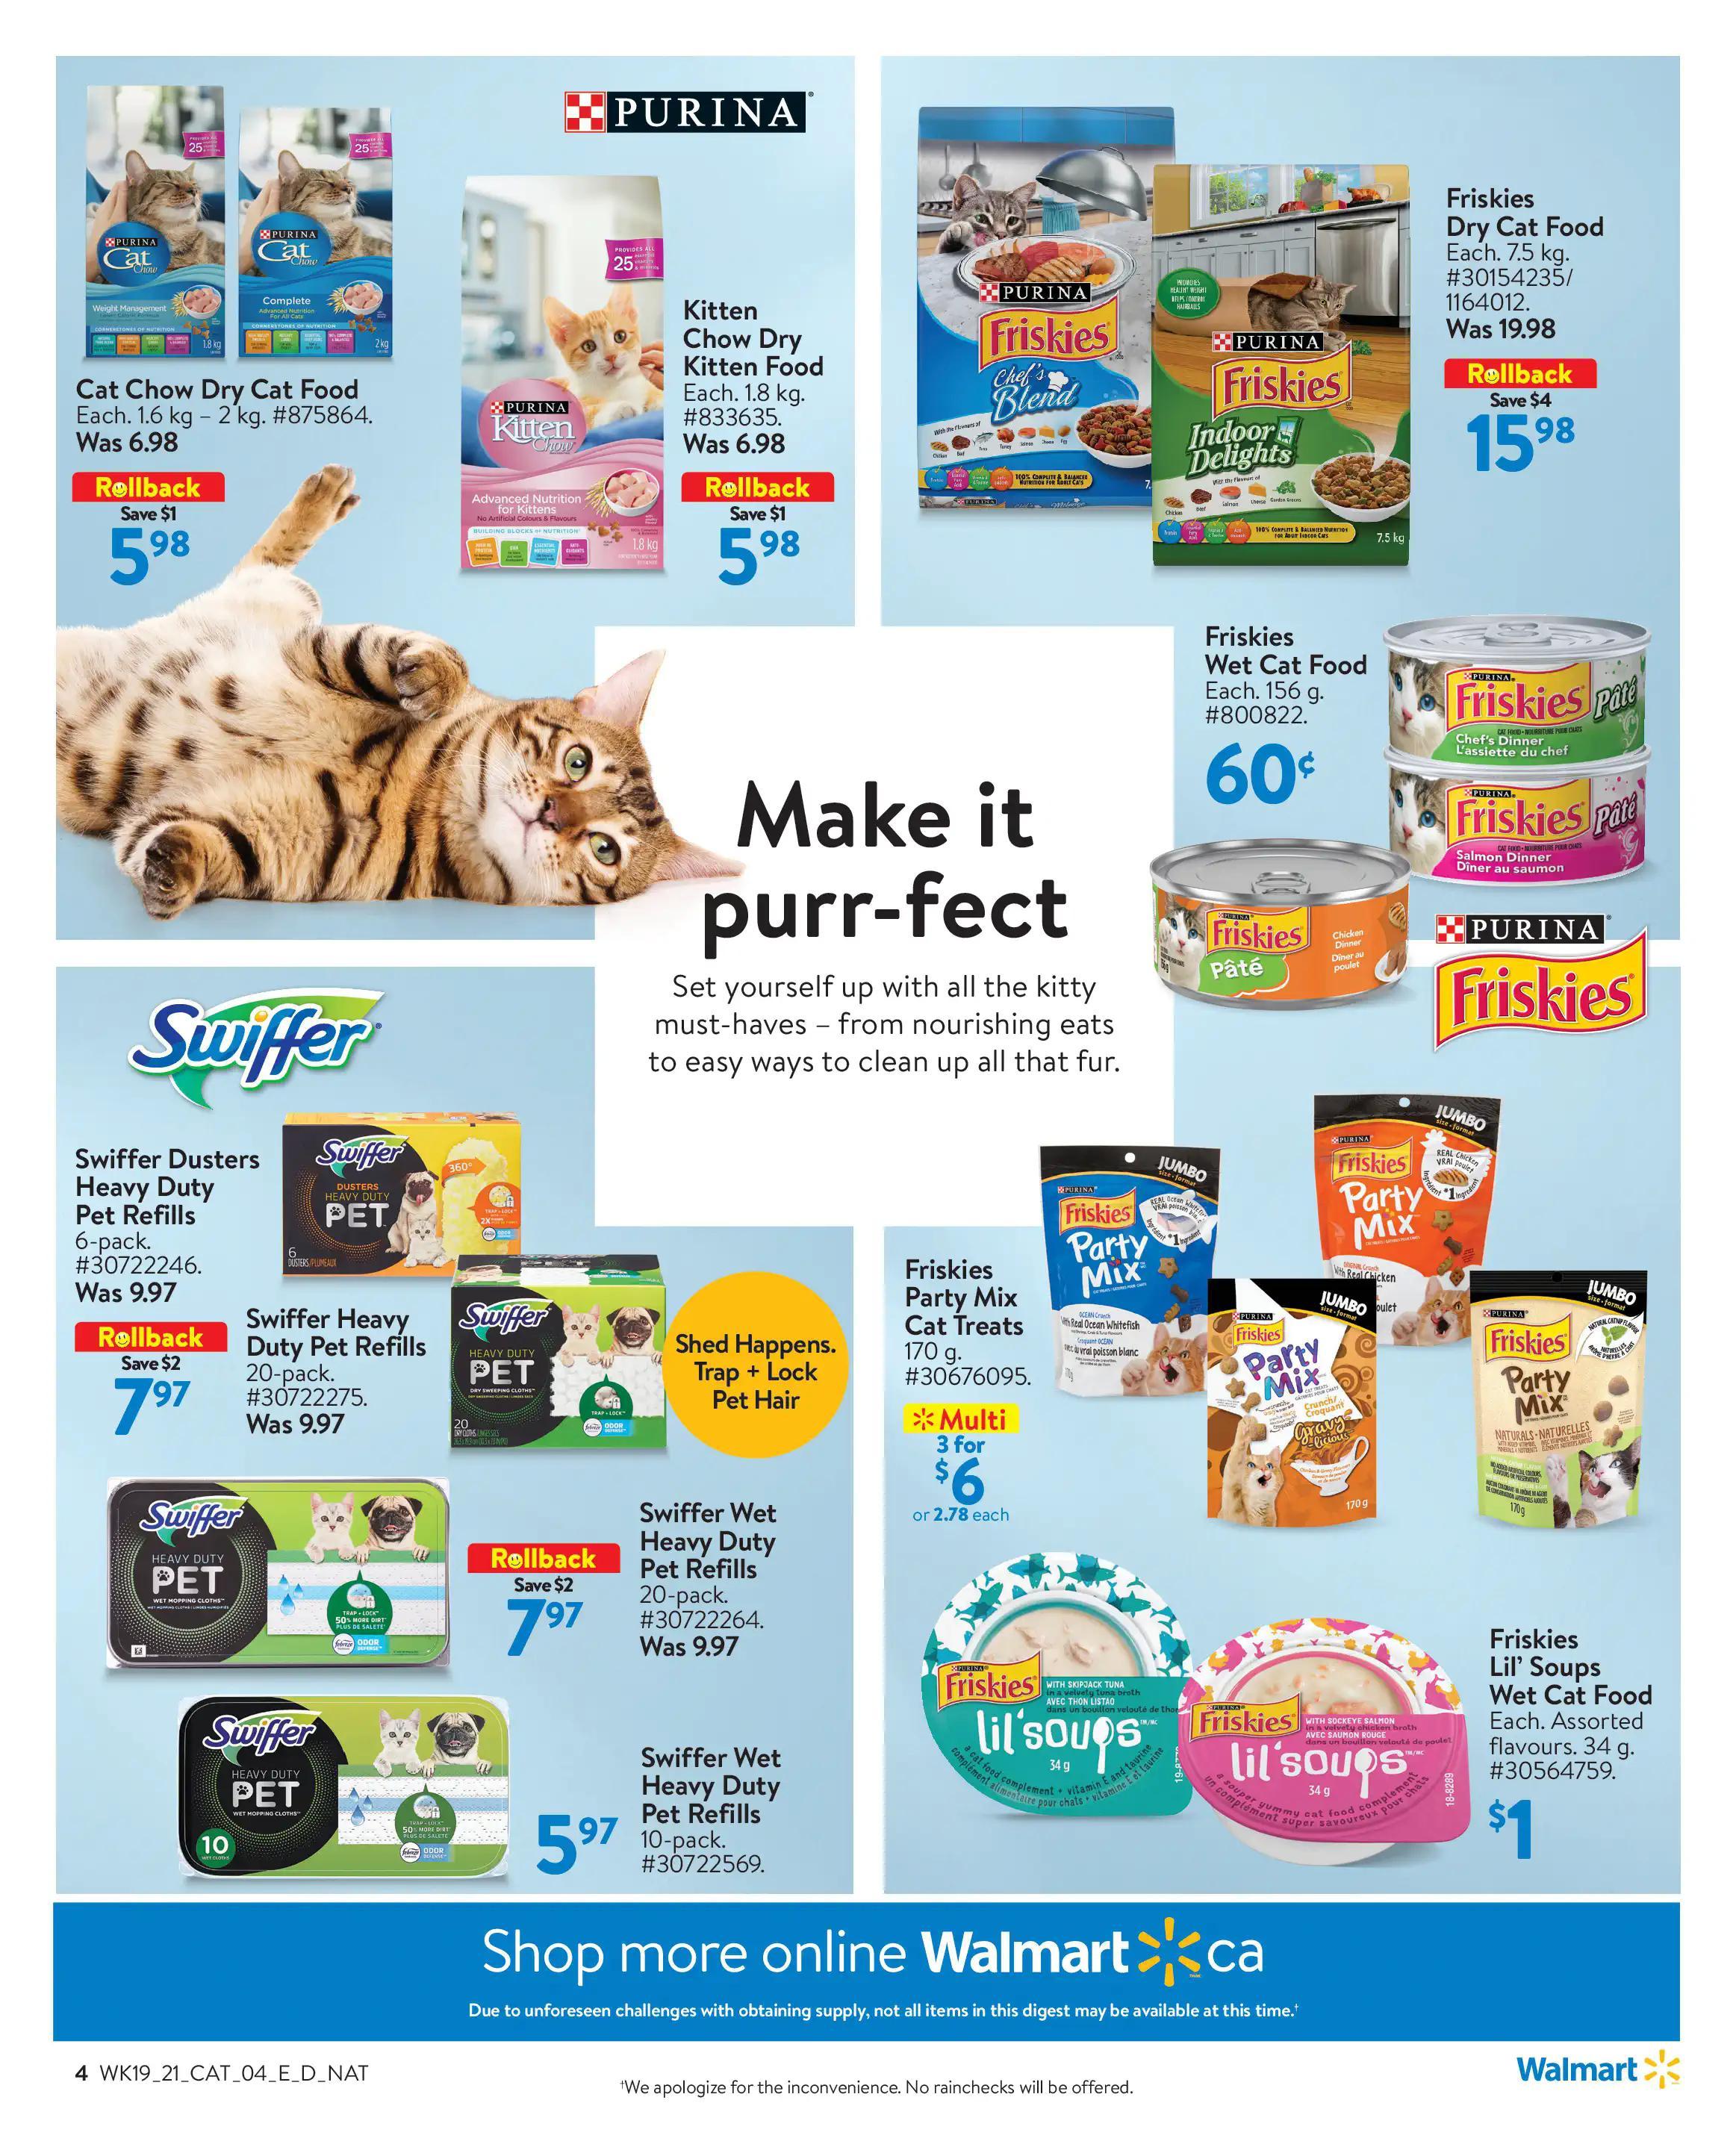 Walmart - Pets - Page 4